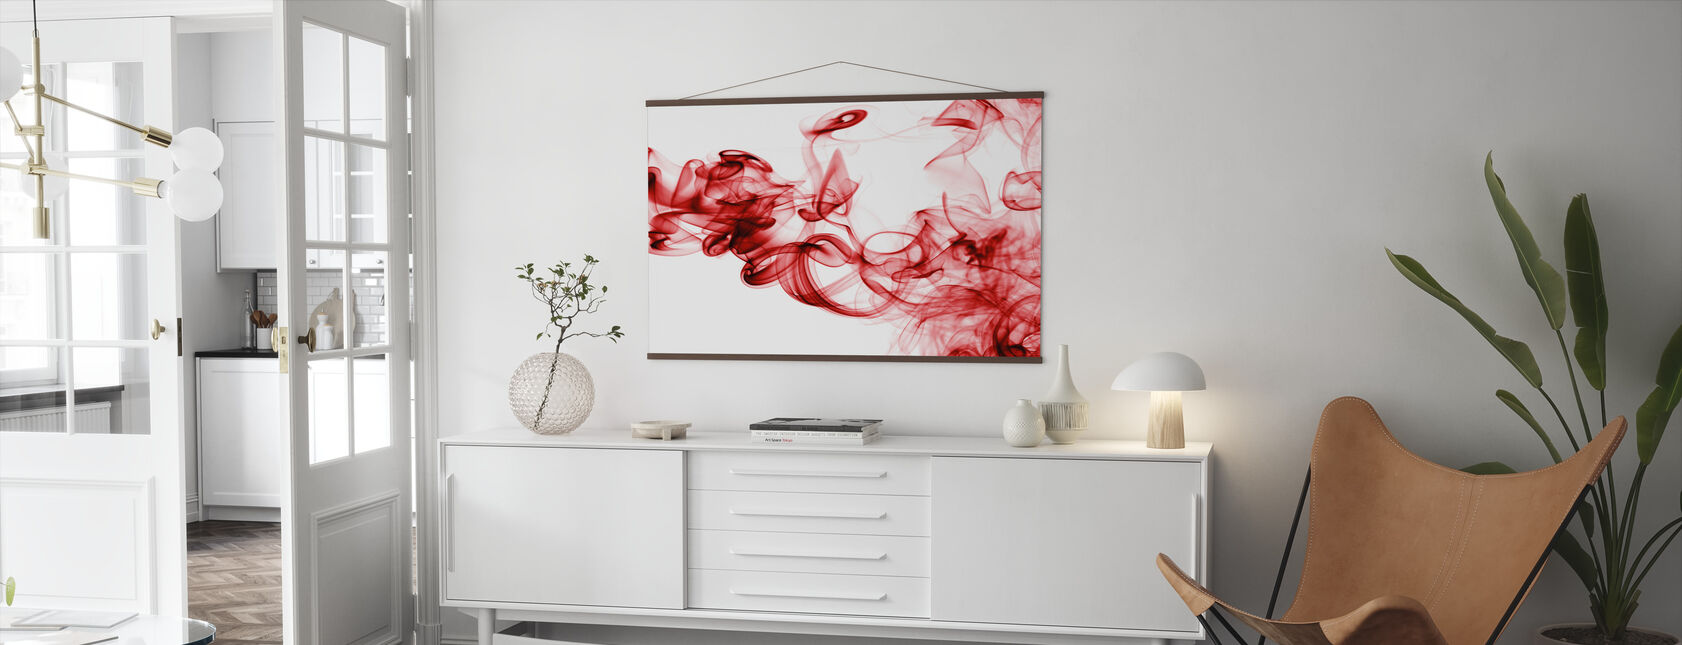 Red Smoke - Poster - Living Room